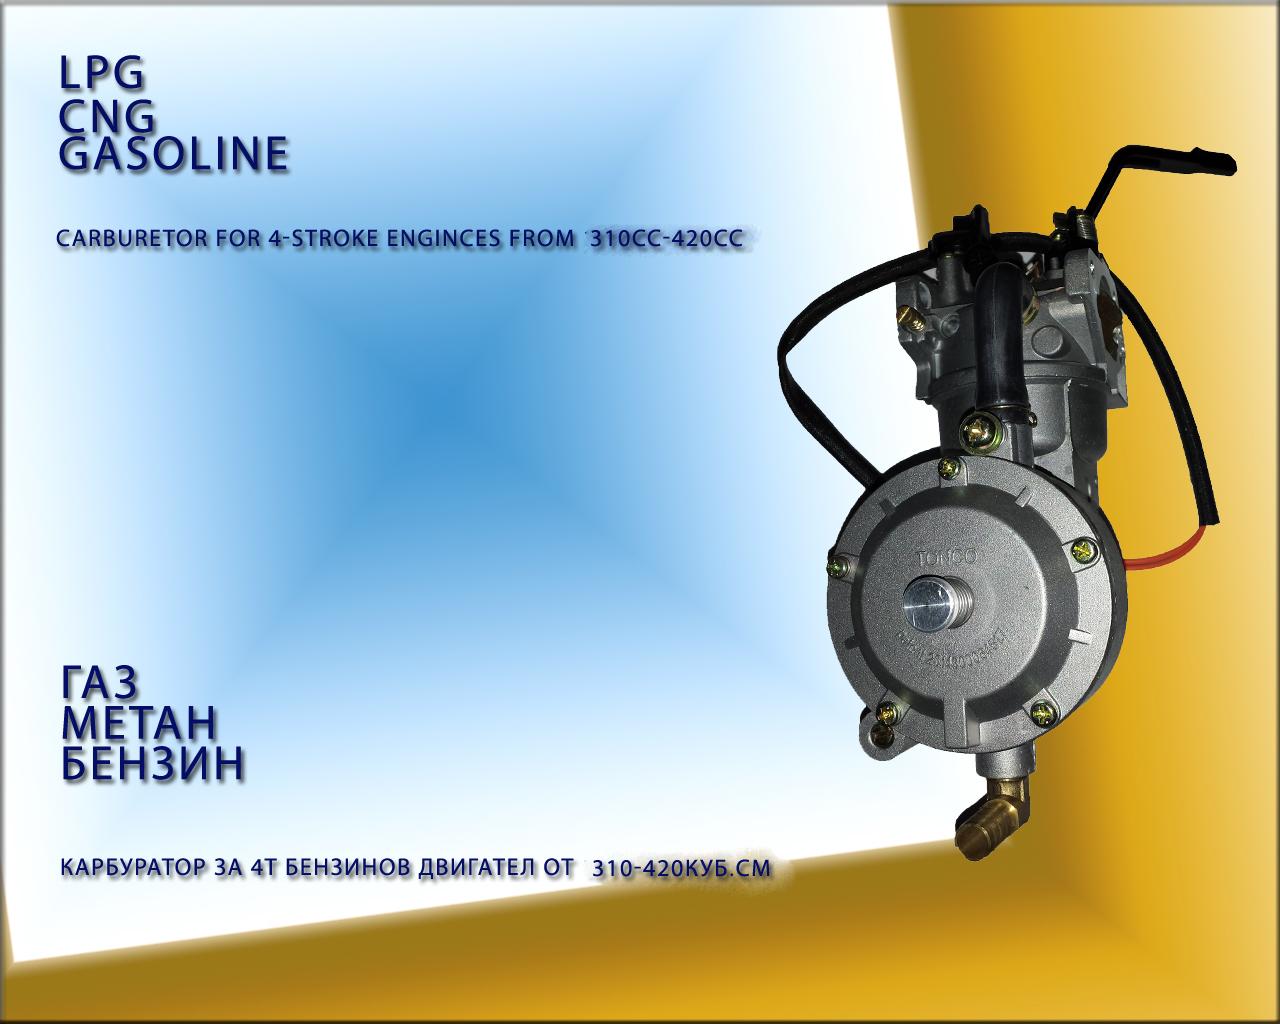 Карбуратор за газ/метан/бензин от 8к.с. до 16 к.с.